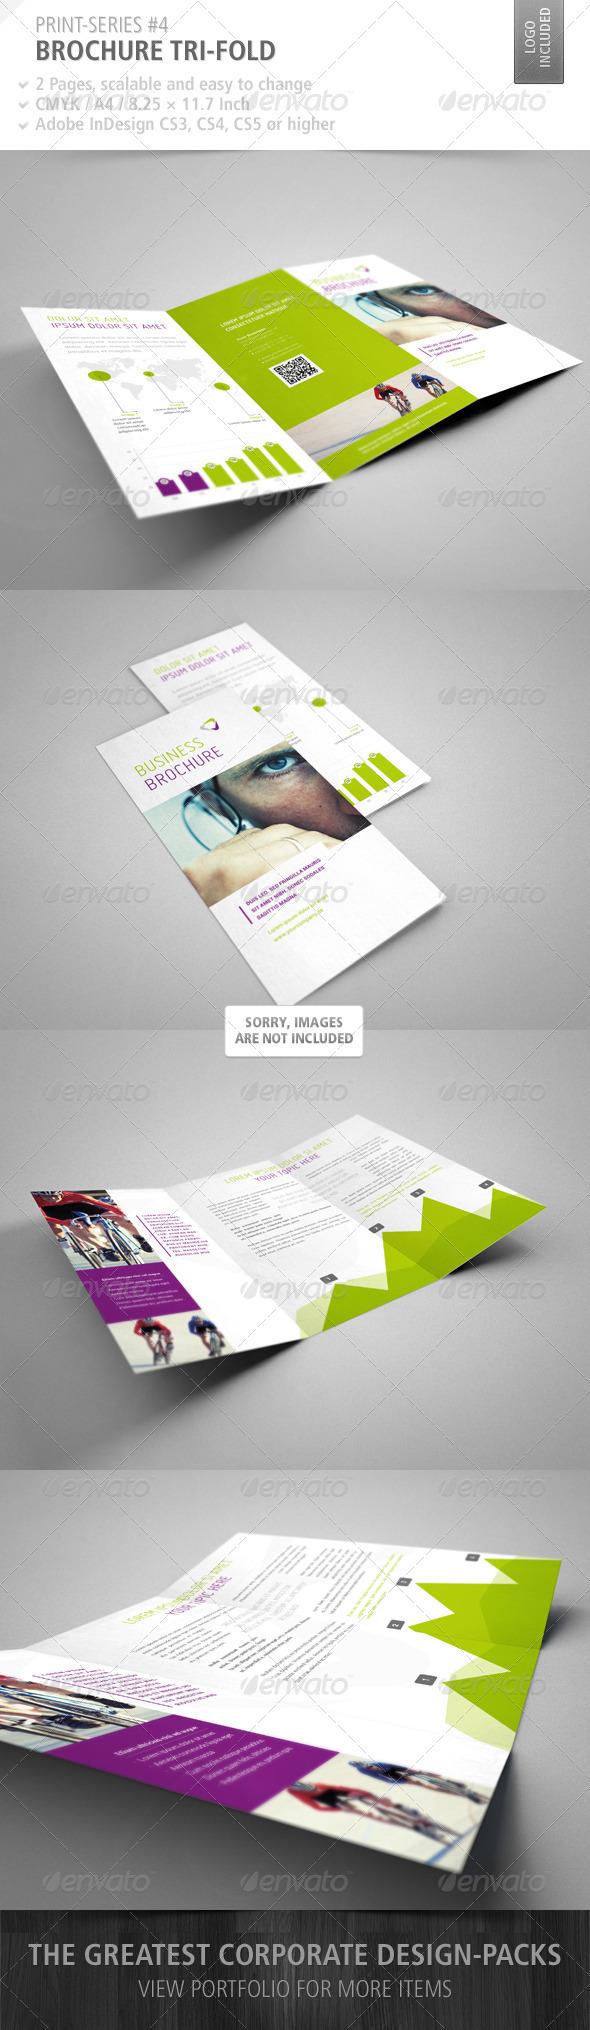 GraphicRiver Brochure Tri-Fold Print-Series #4 3270356